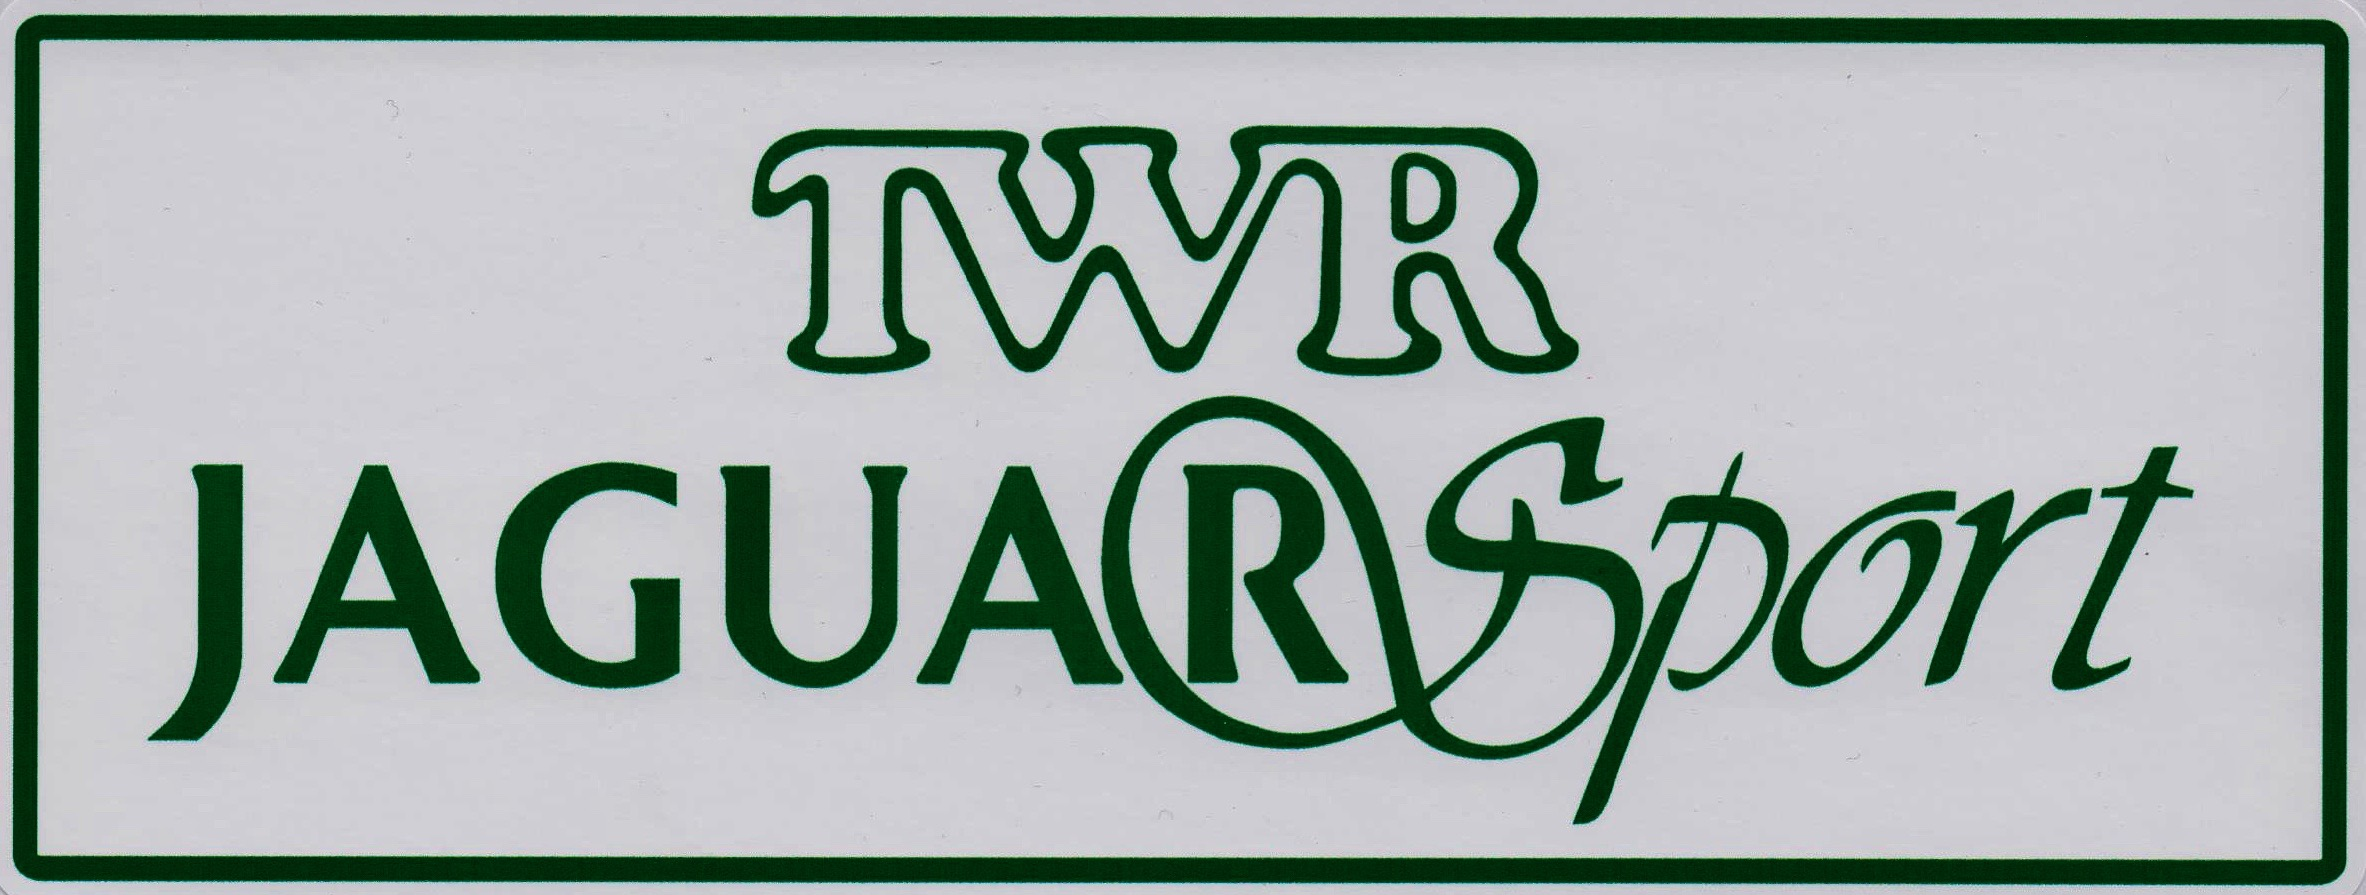 TWR Jaguar Sport Sticker